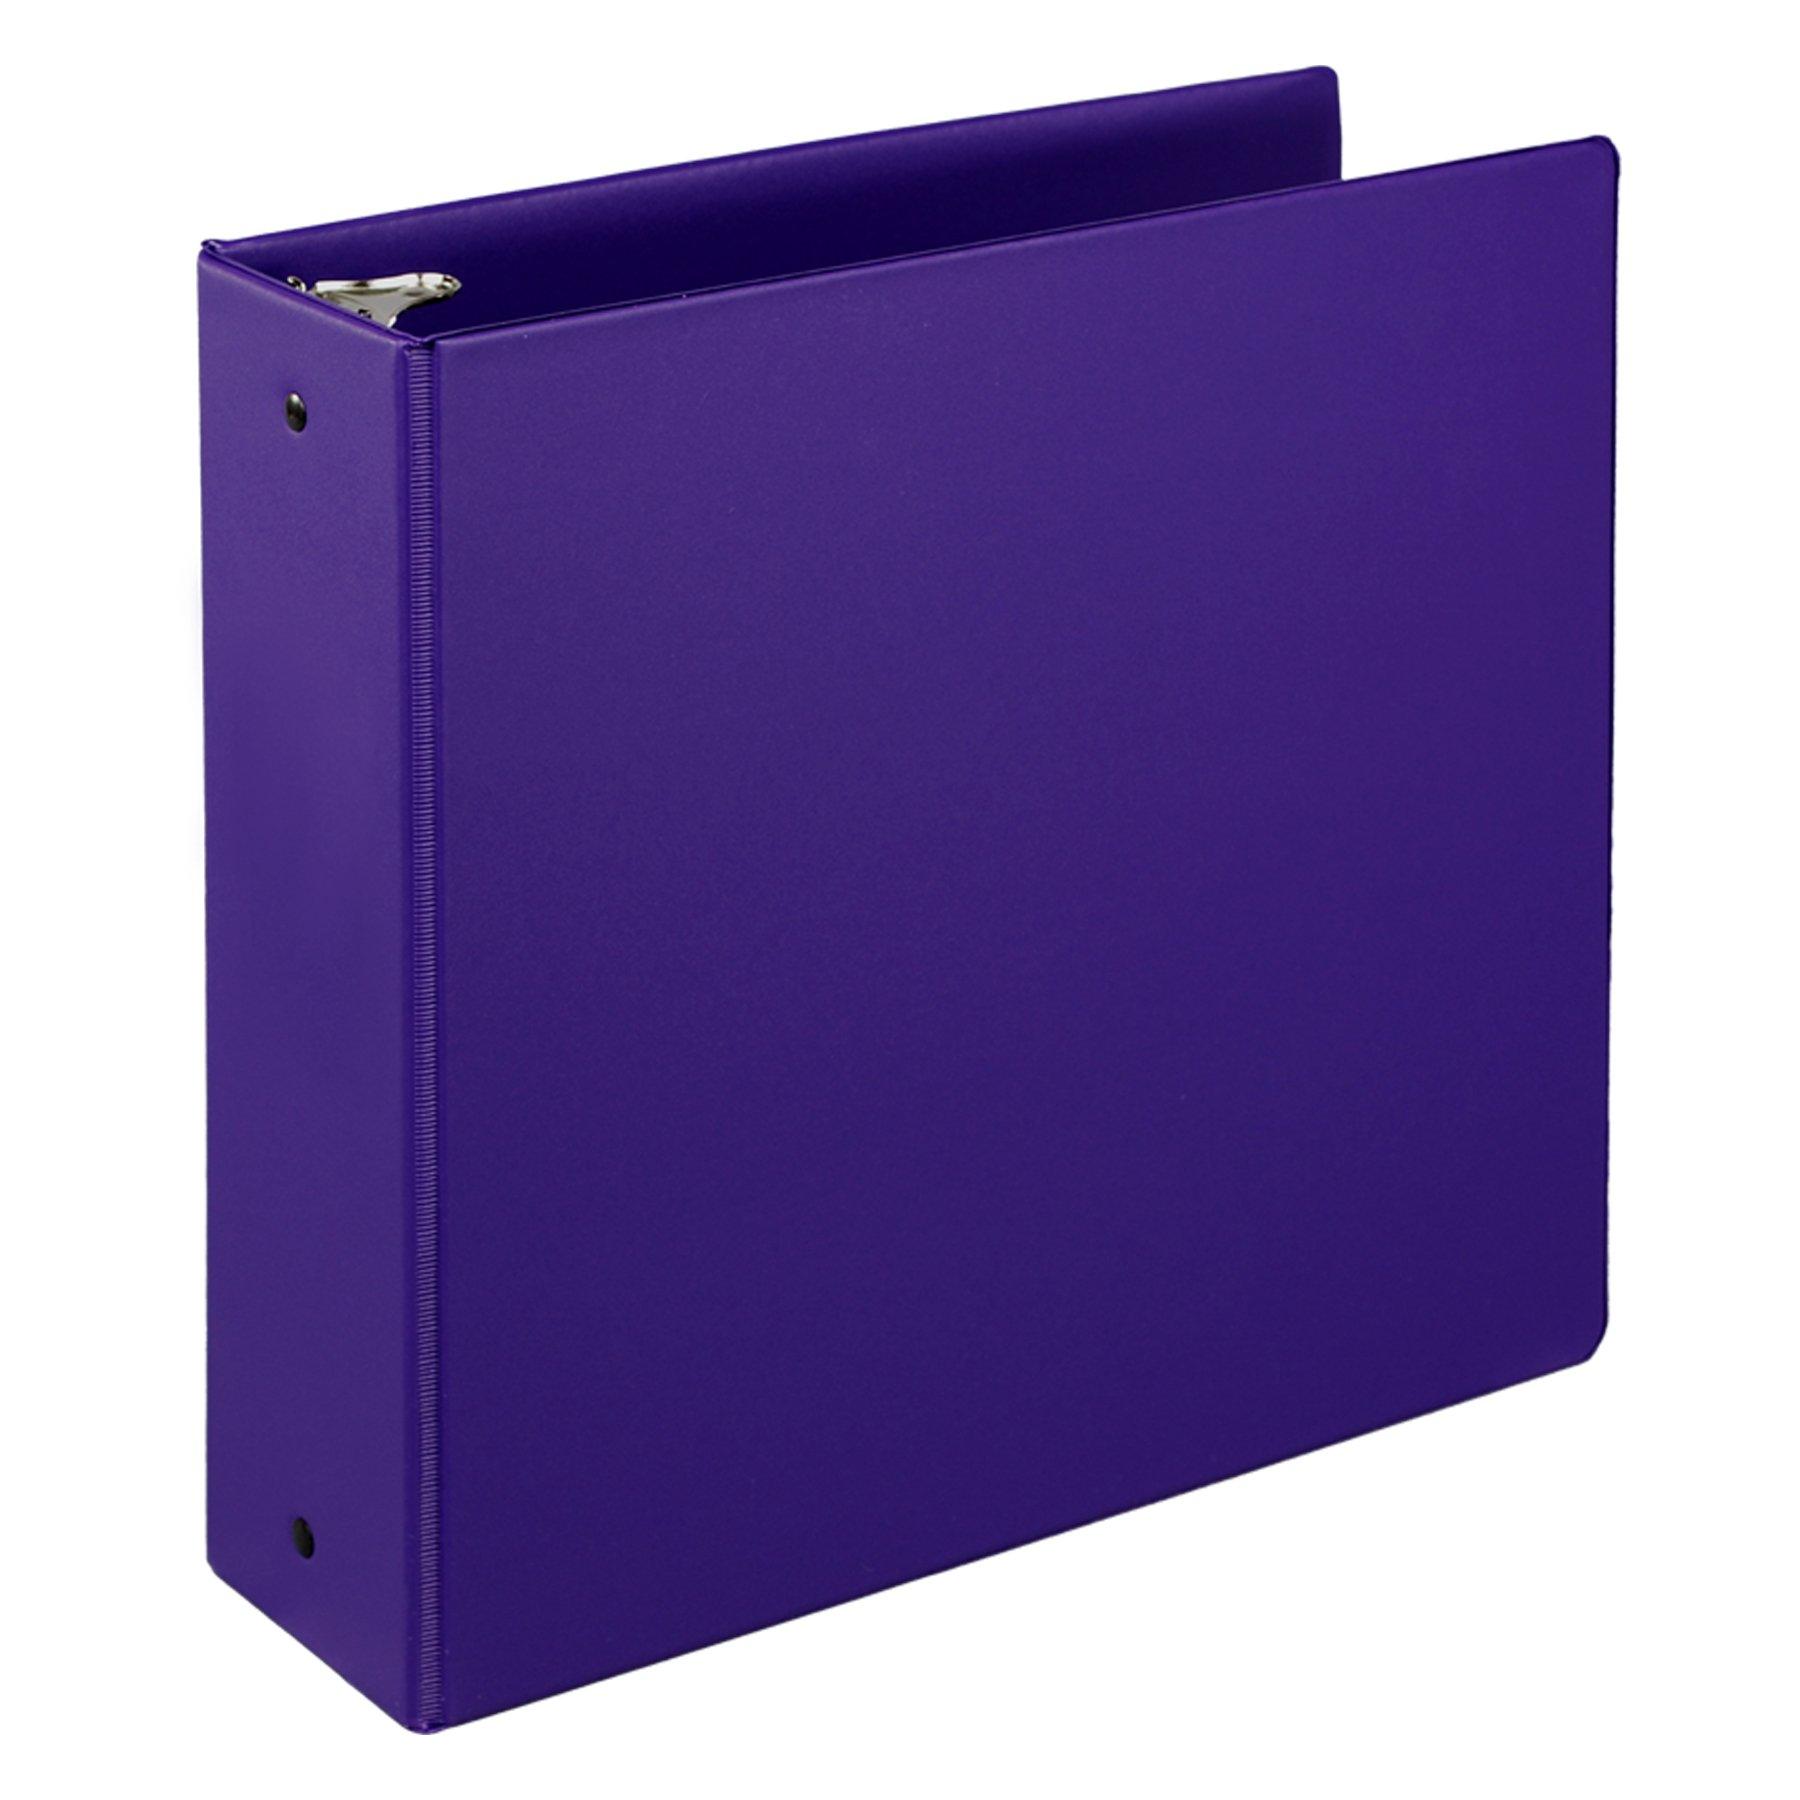 Samsill 3 Inch Value Document Storage 3 Ring Binder , Round Ring, 11 x 8.5 Inches, Purple (11808)